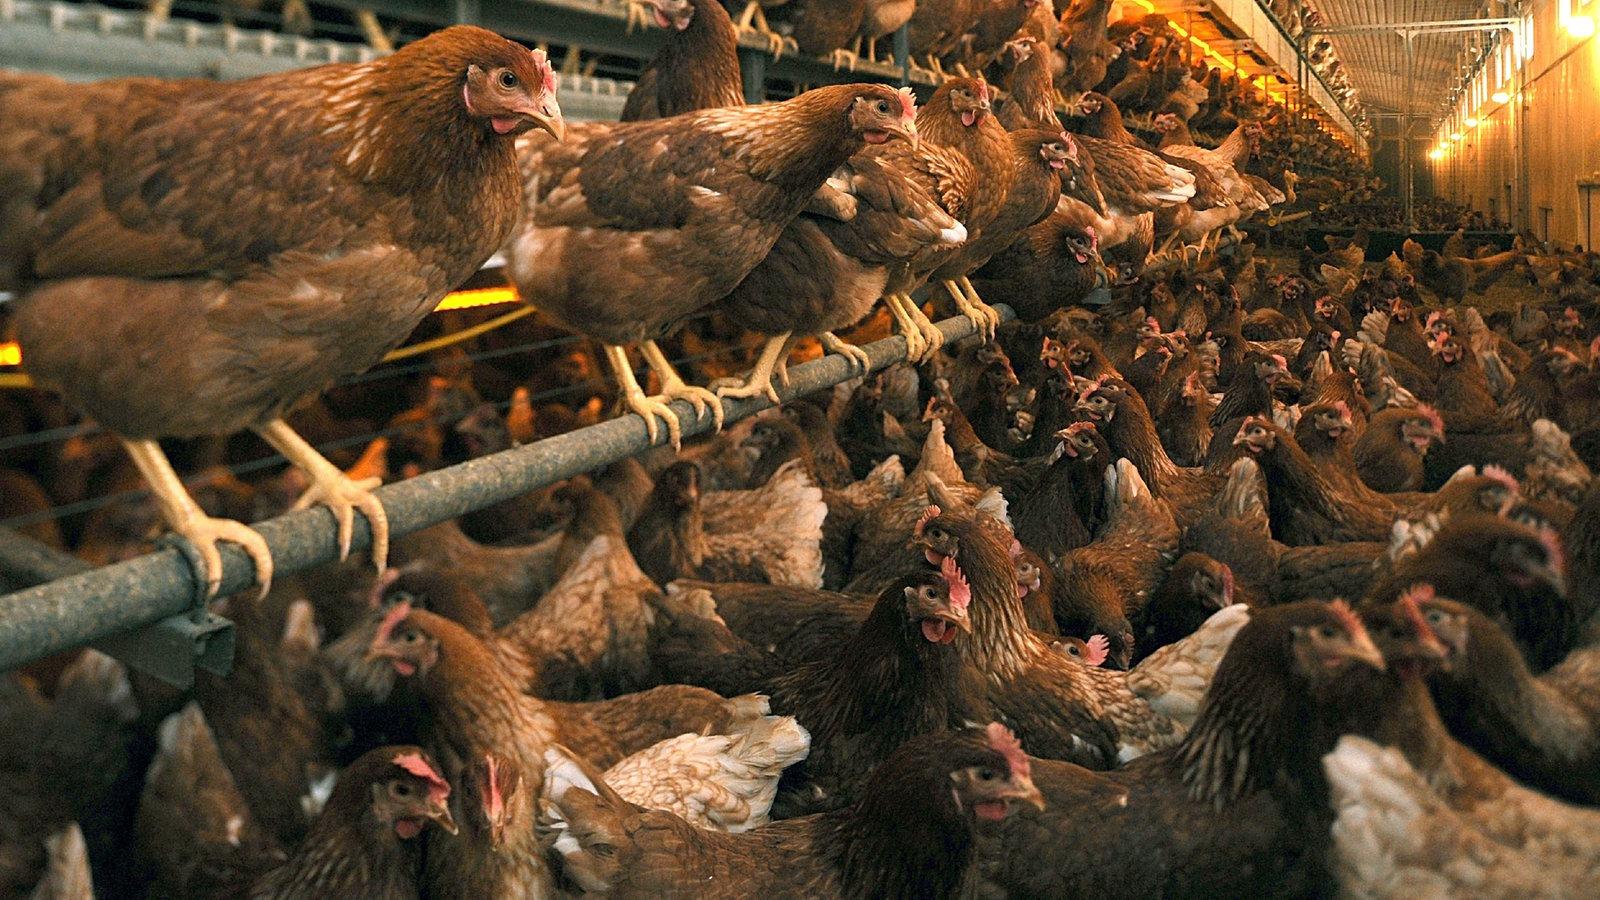 Tierschutz: Tierschutz - Tierschutz - Naturschutz - Natur